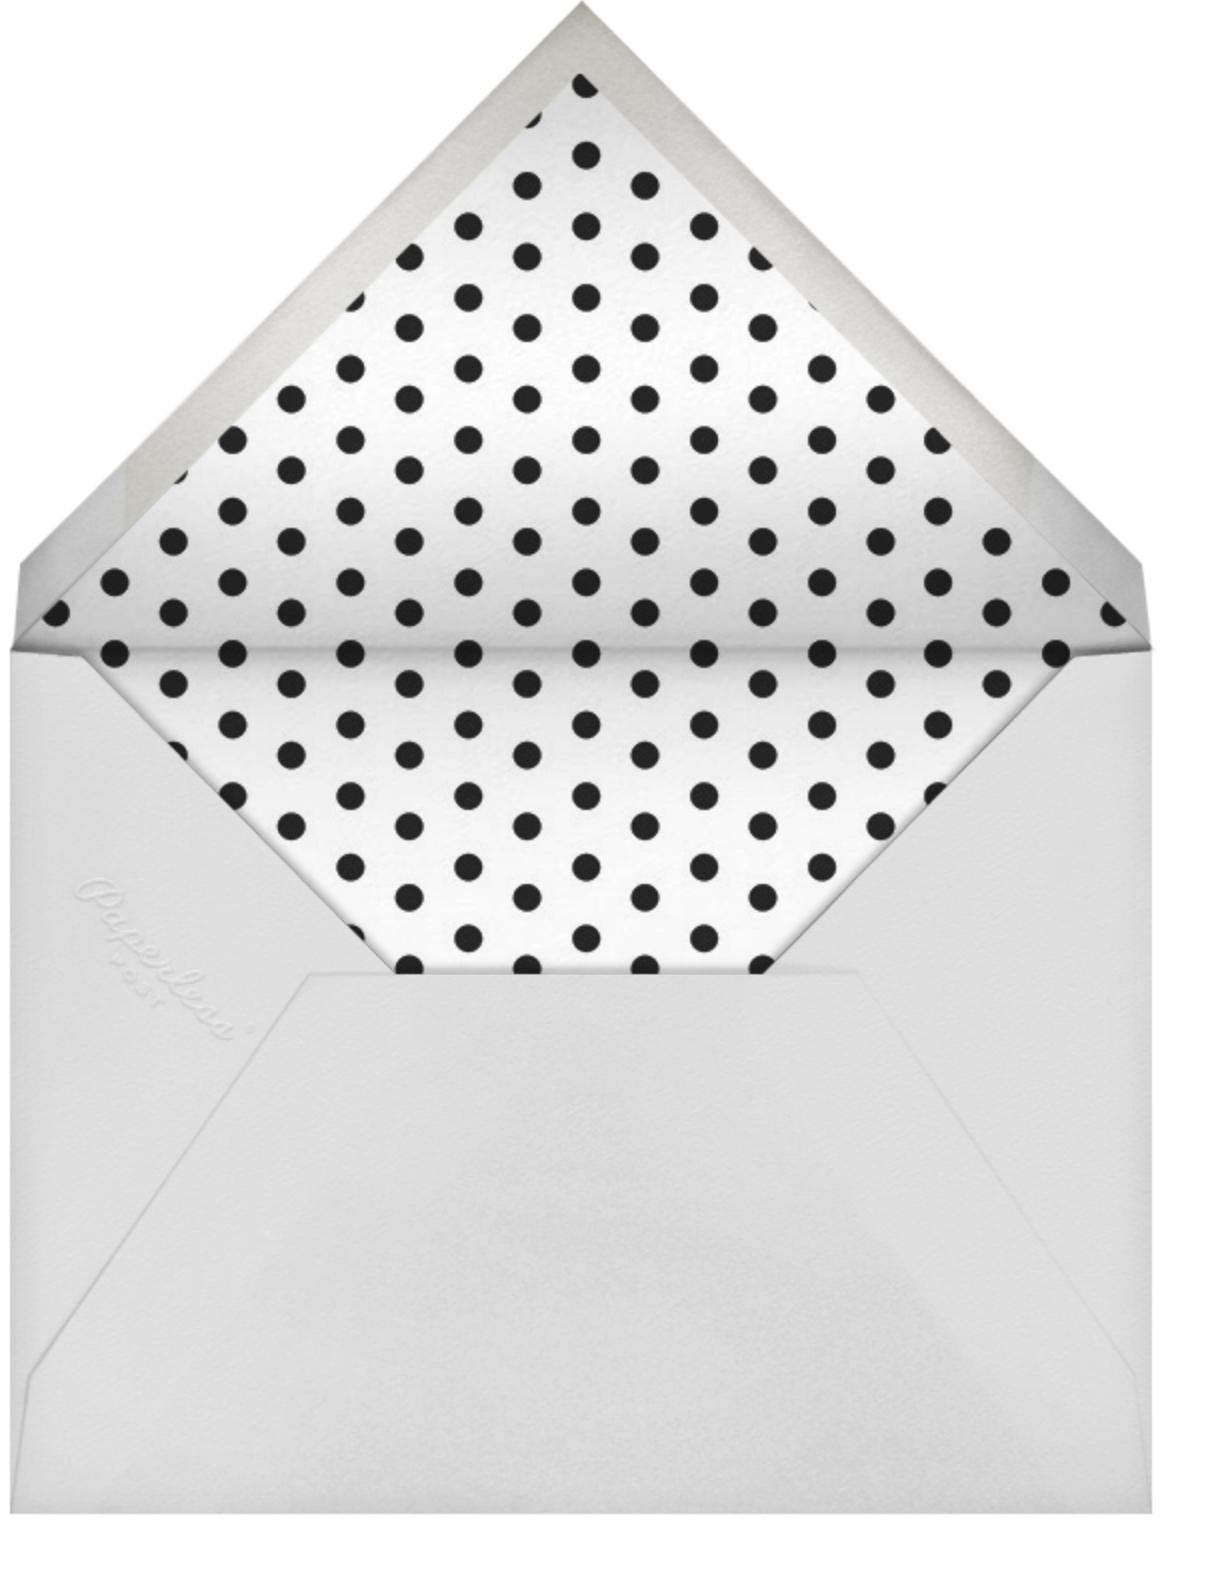 Tandem II (Invitation) - kate spade new york - Envelope